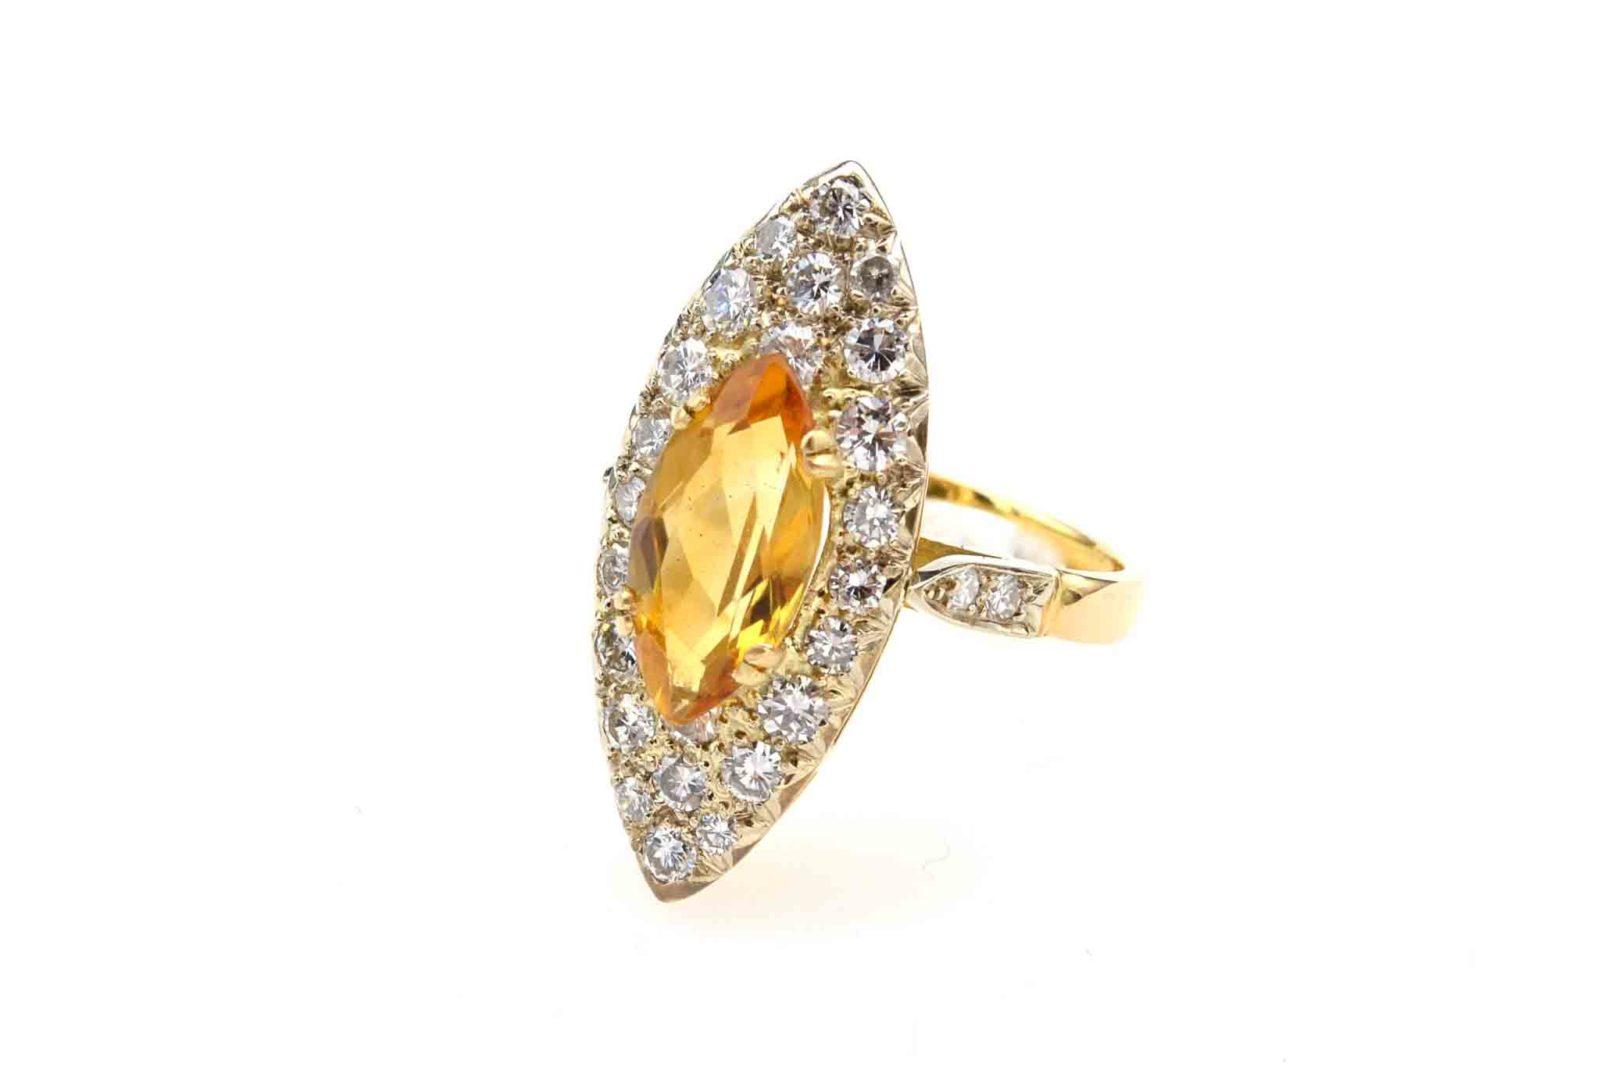 Bague marquise citrine diamants